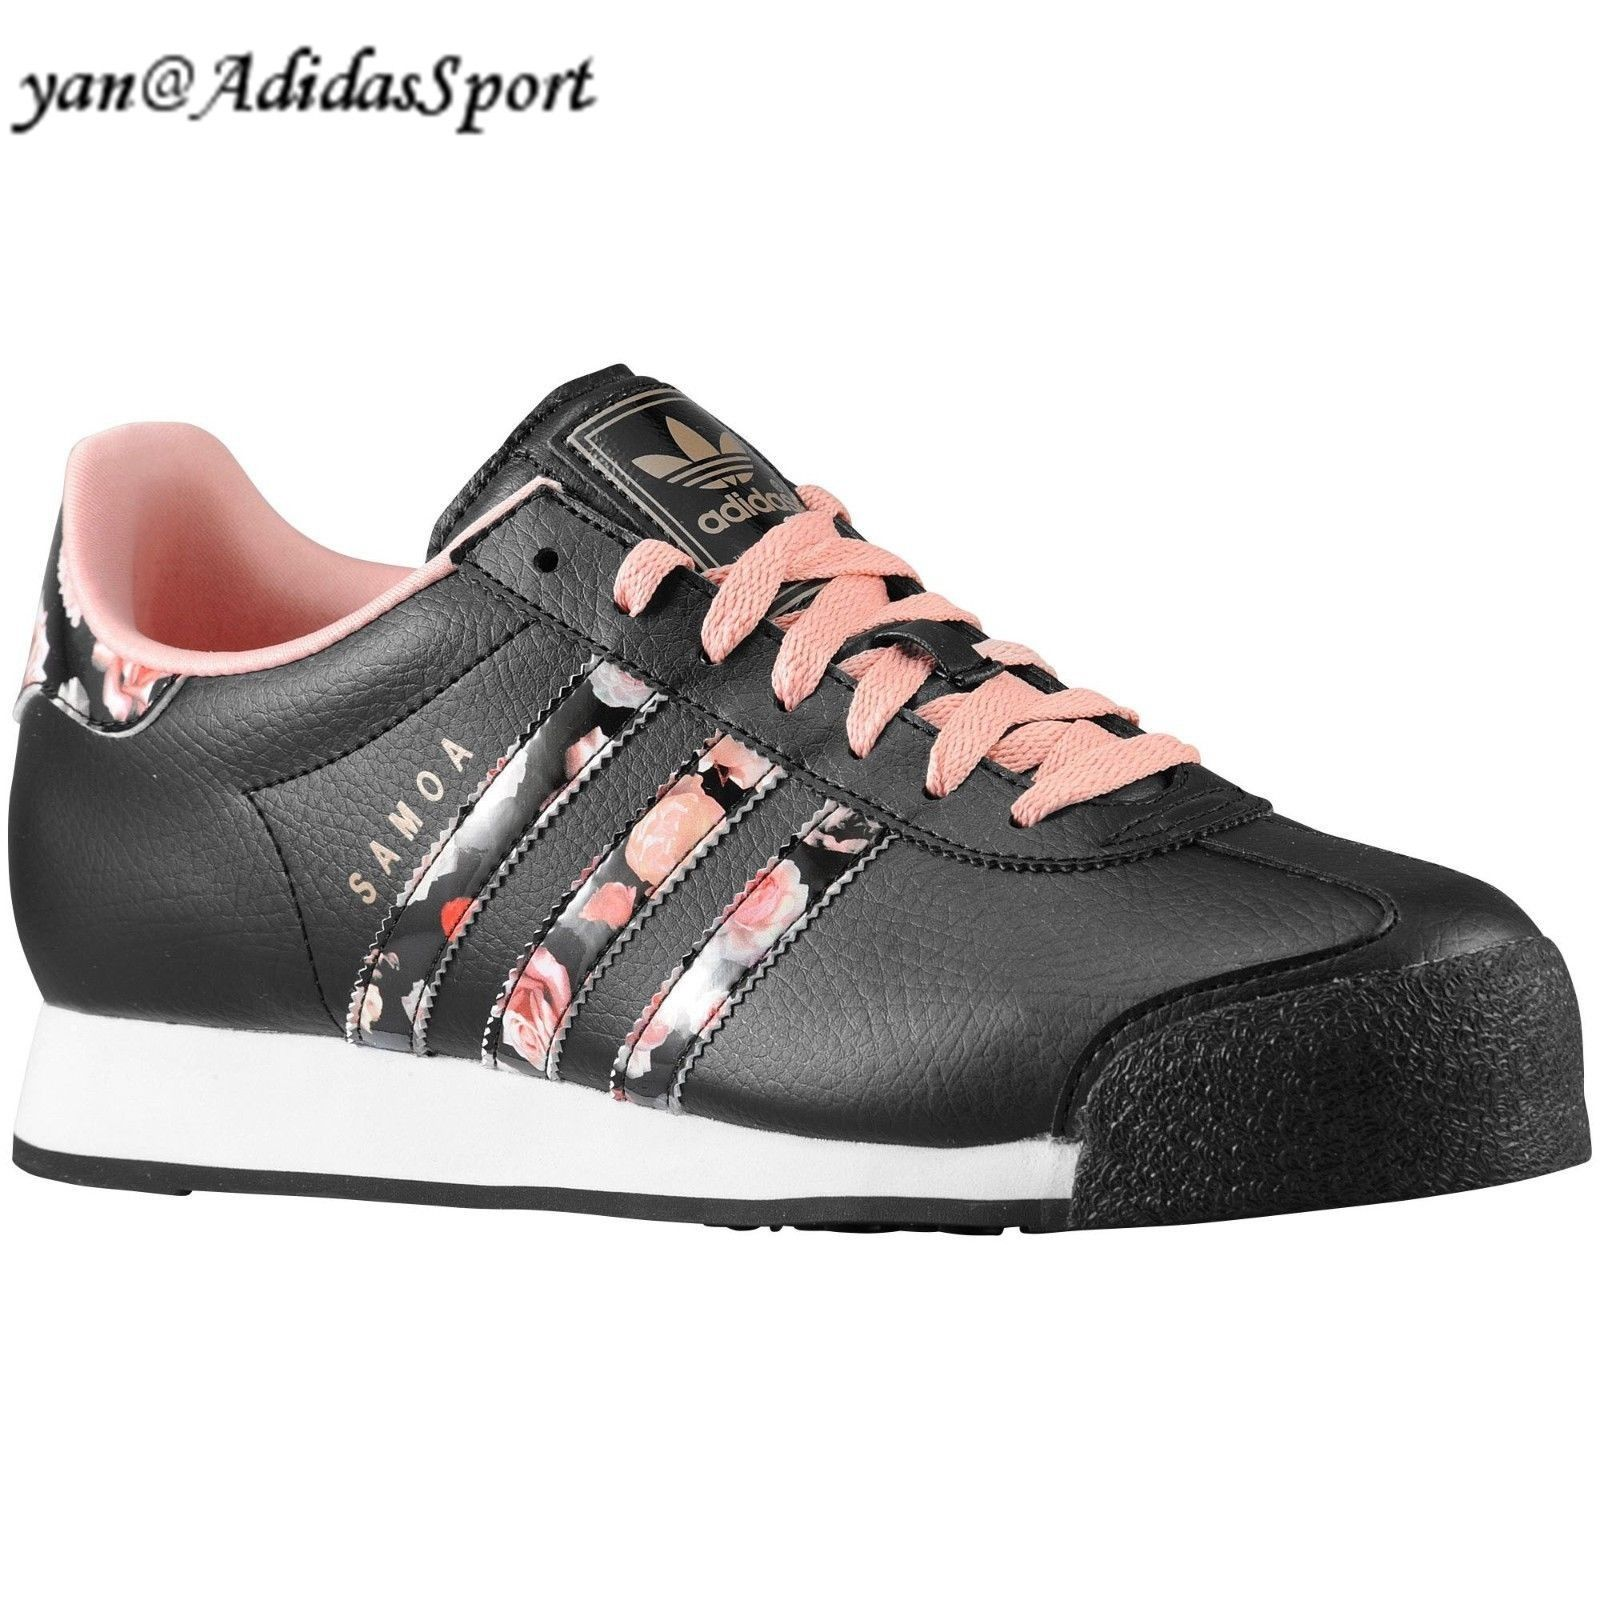 Adidas Originals X Samoa W Flower Black Run White Frost Pink Womens 8 5 7